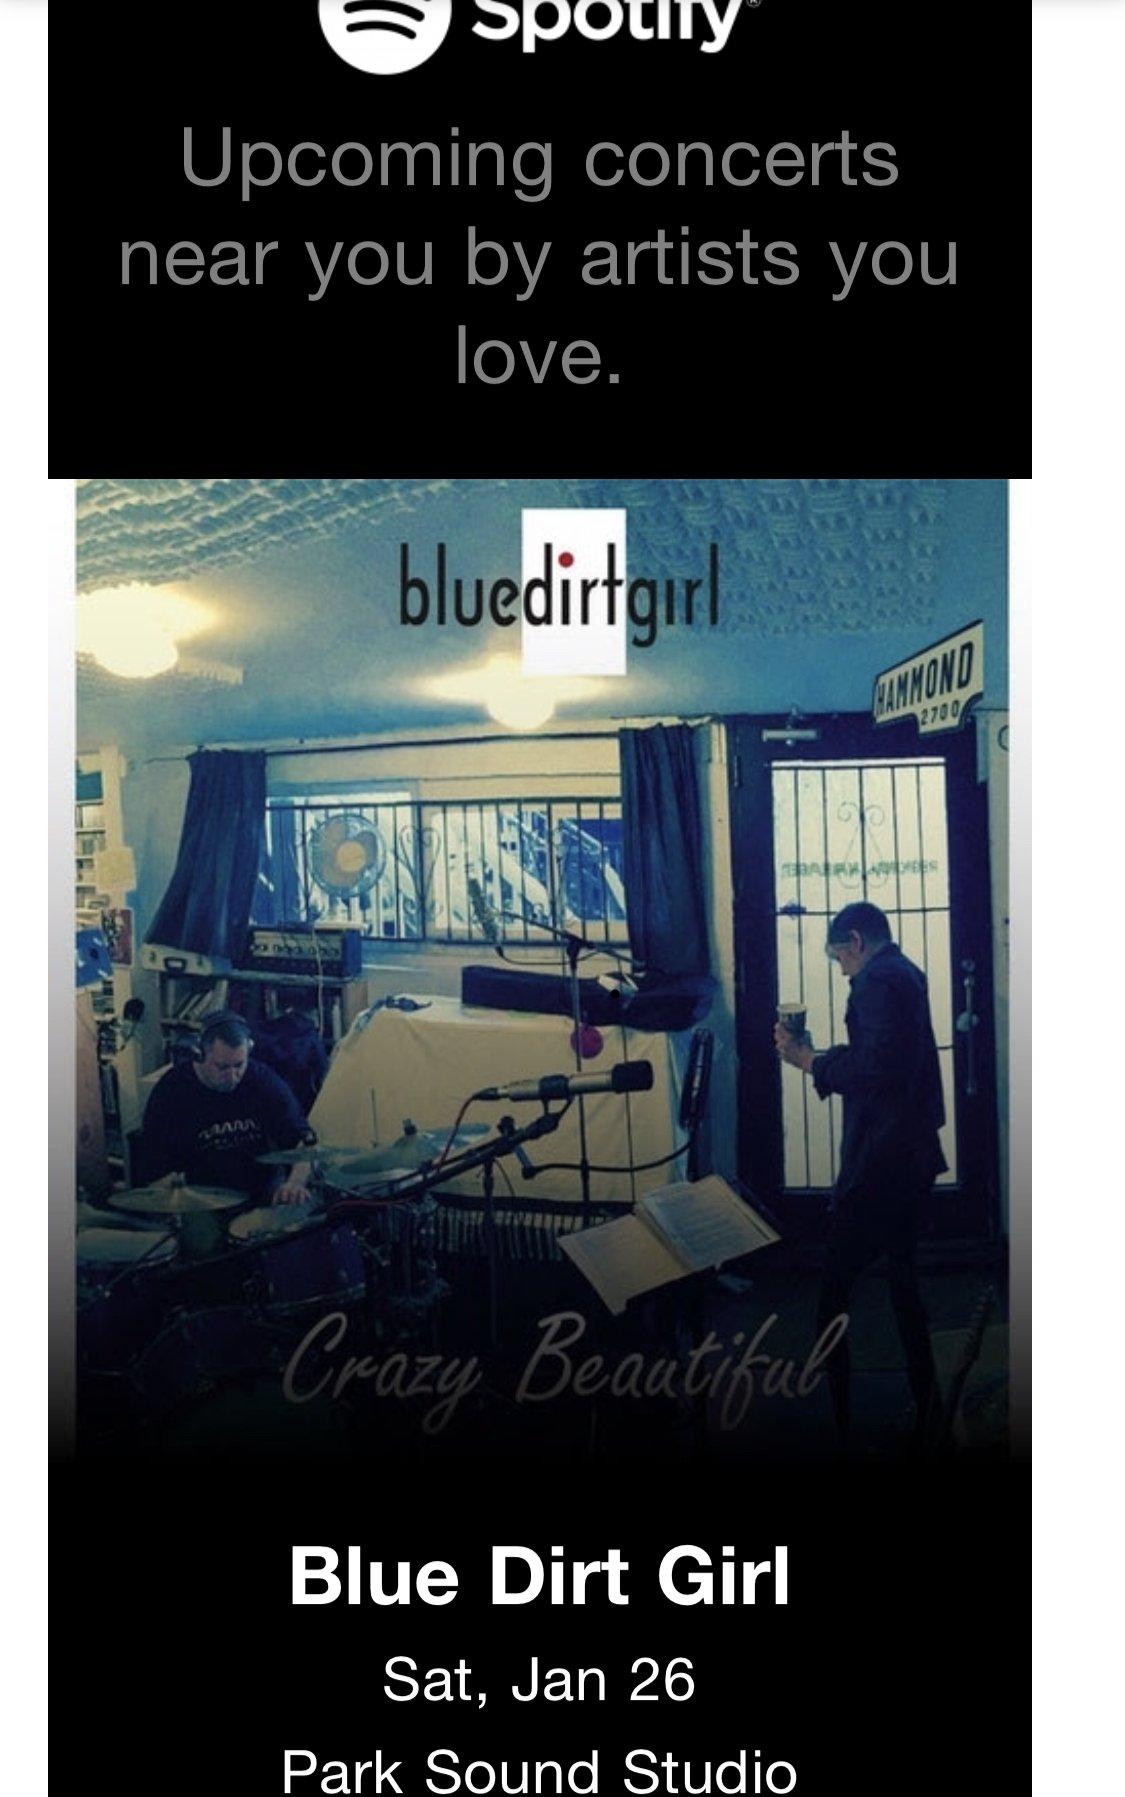 blue dirt girl girl SPOTIFY show email Jan 19